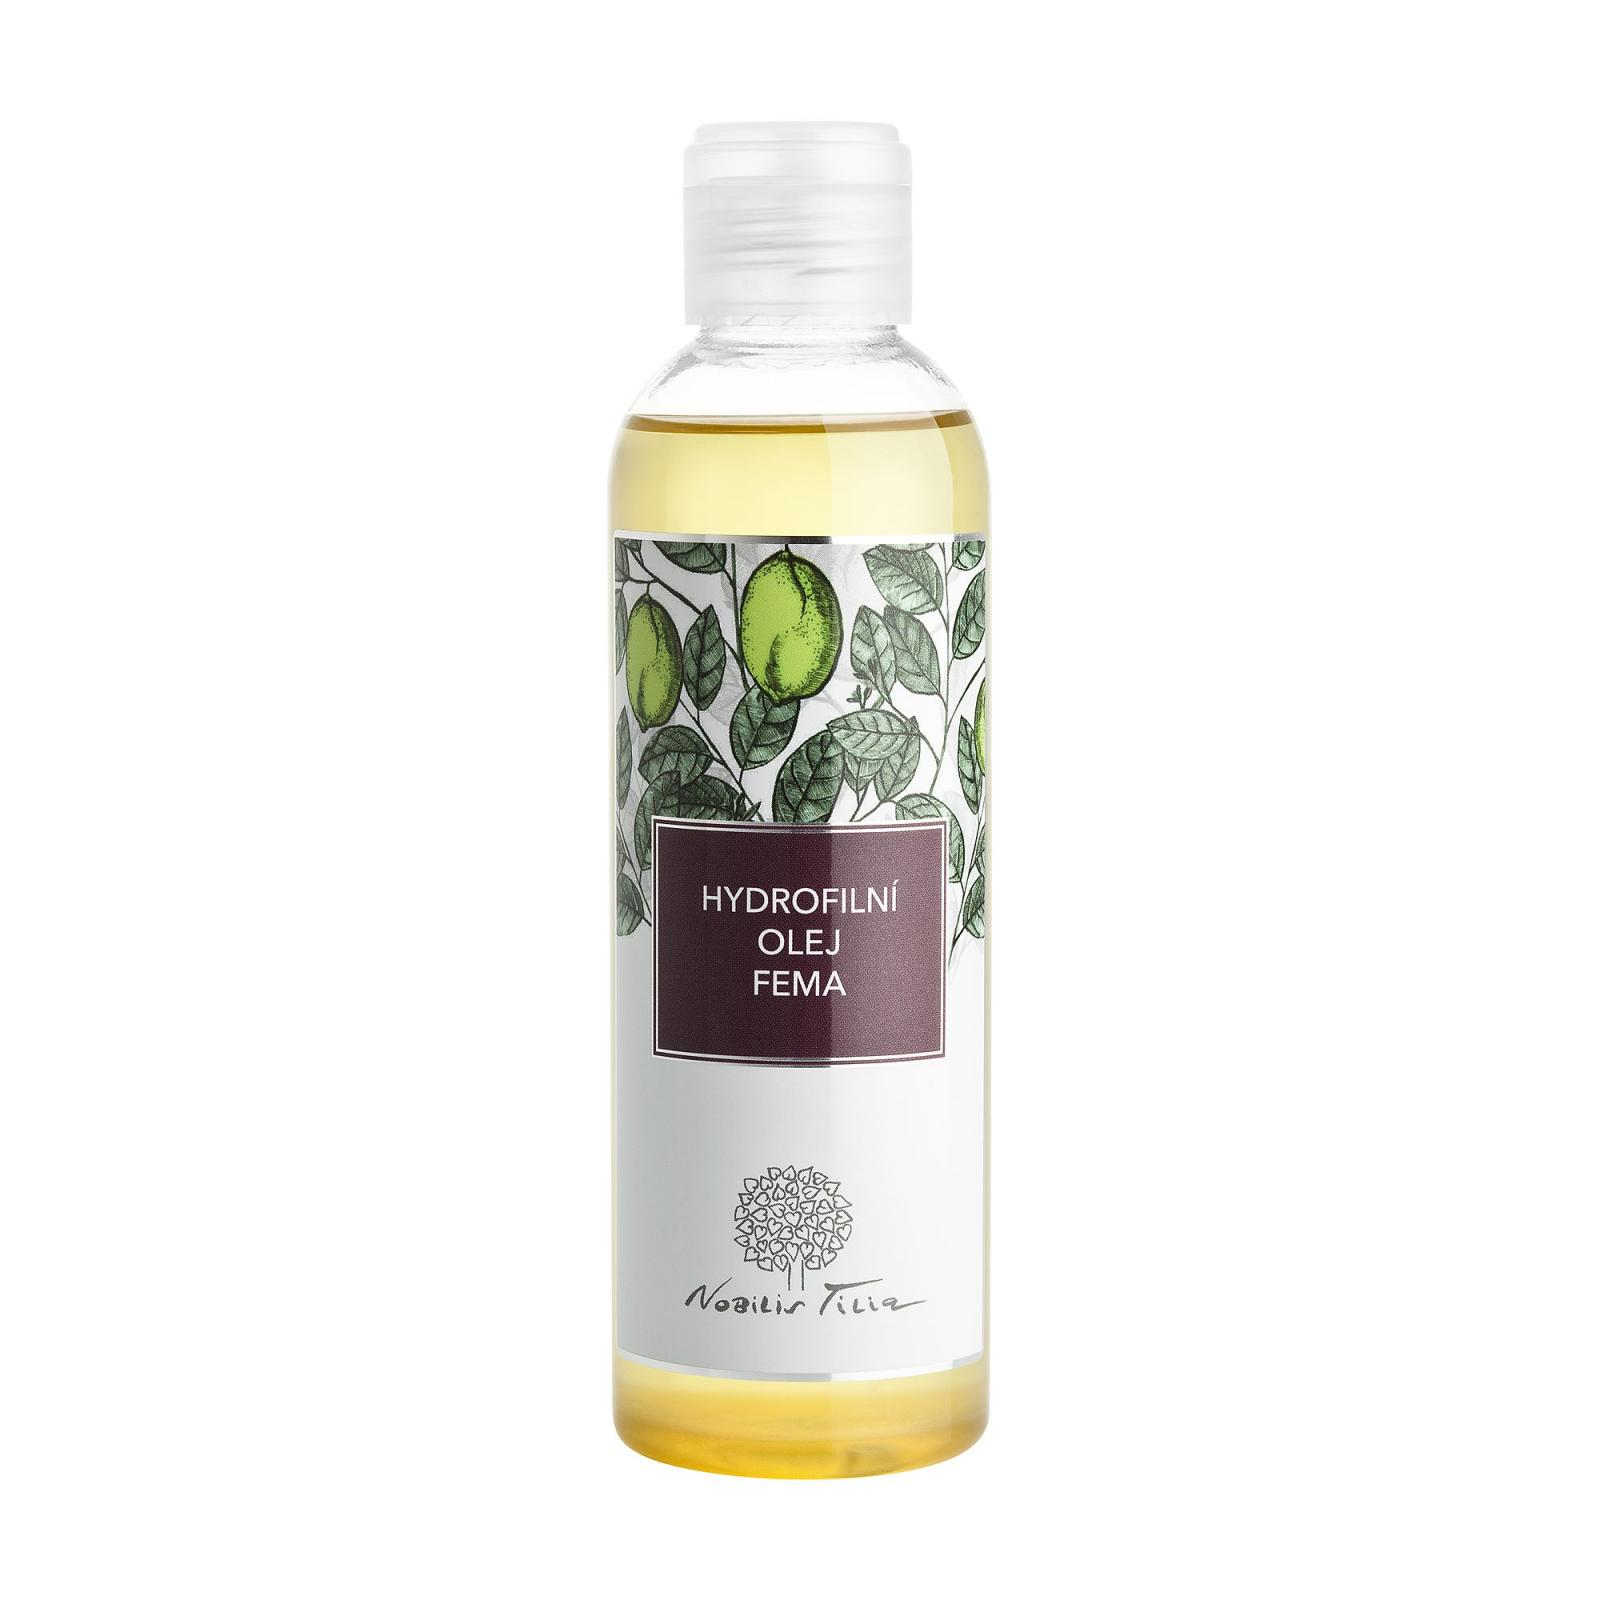 Nobilis Tilia Hydrofilní olej Fema 200 ml